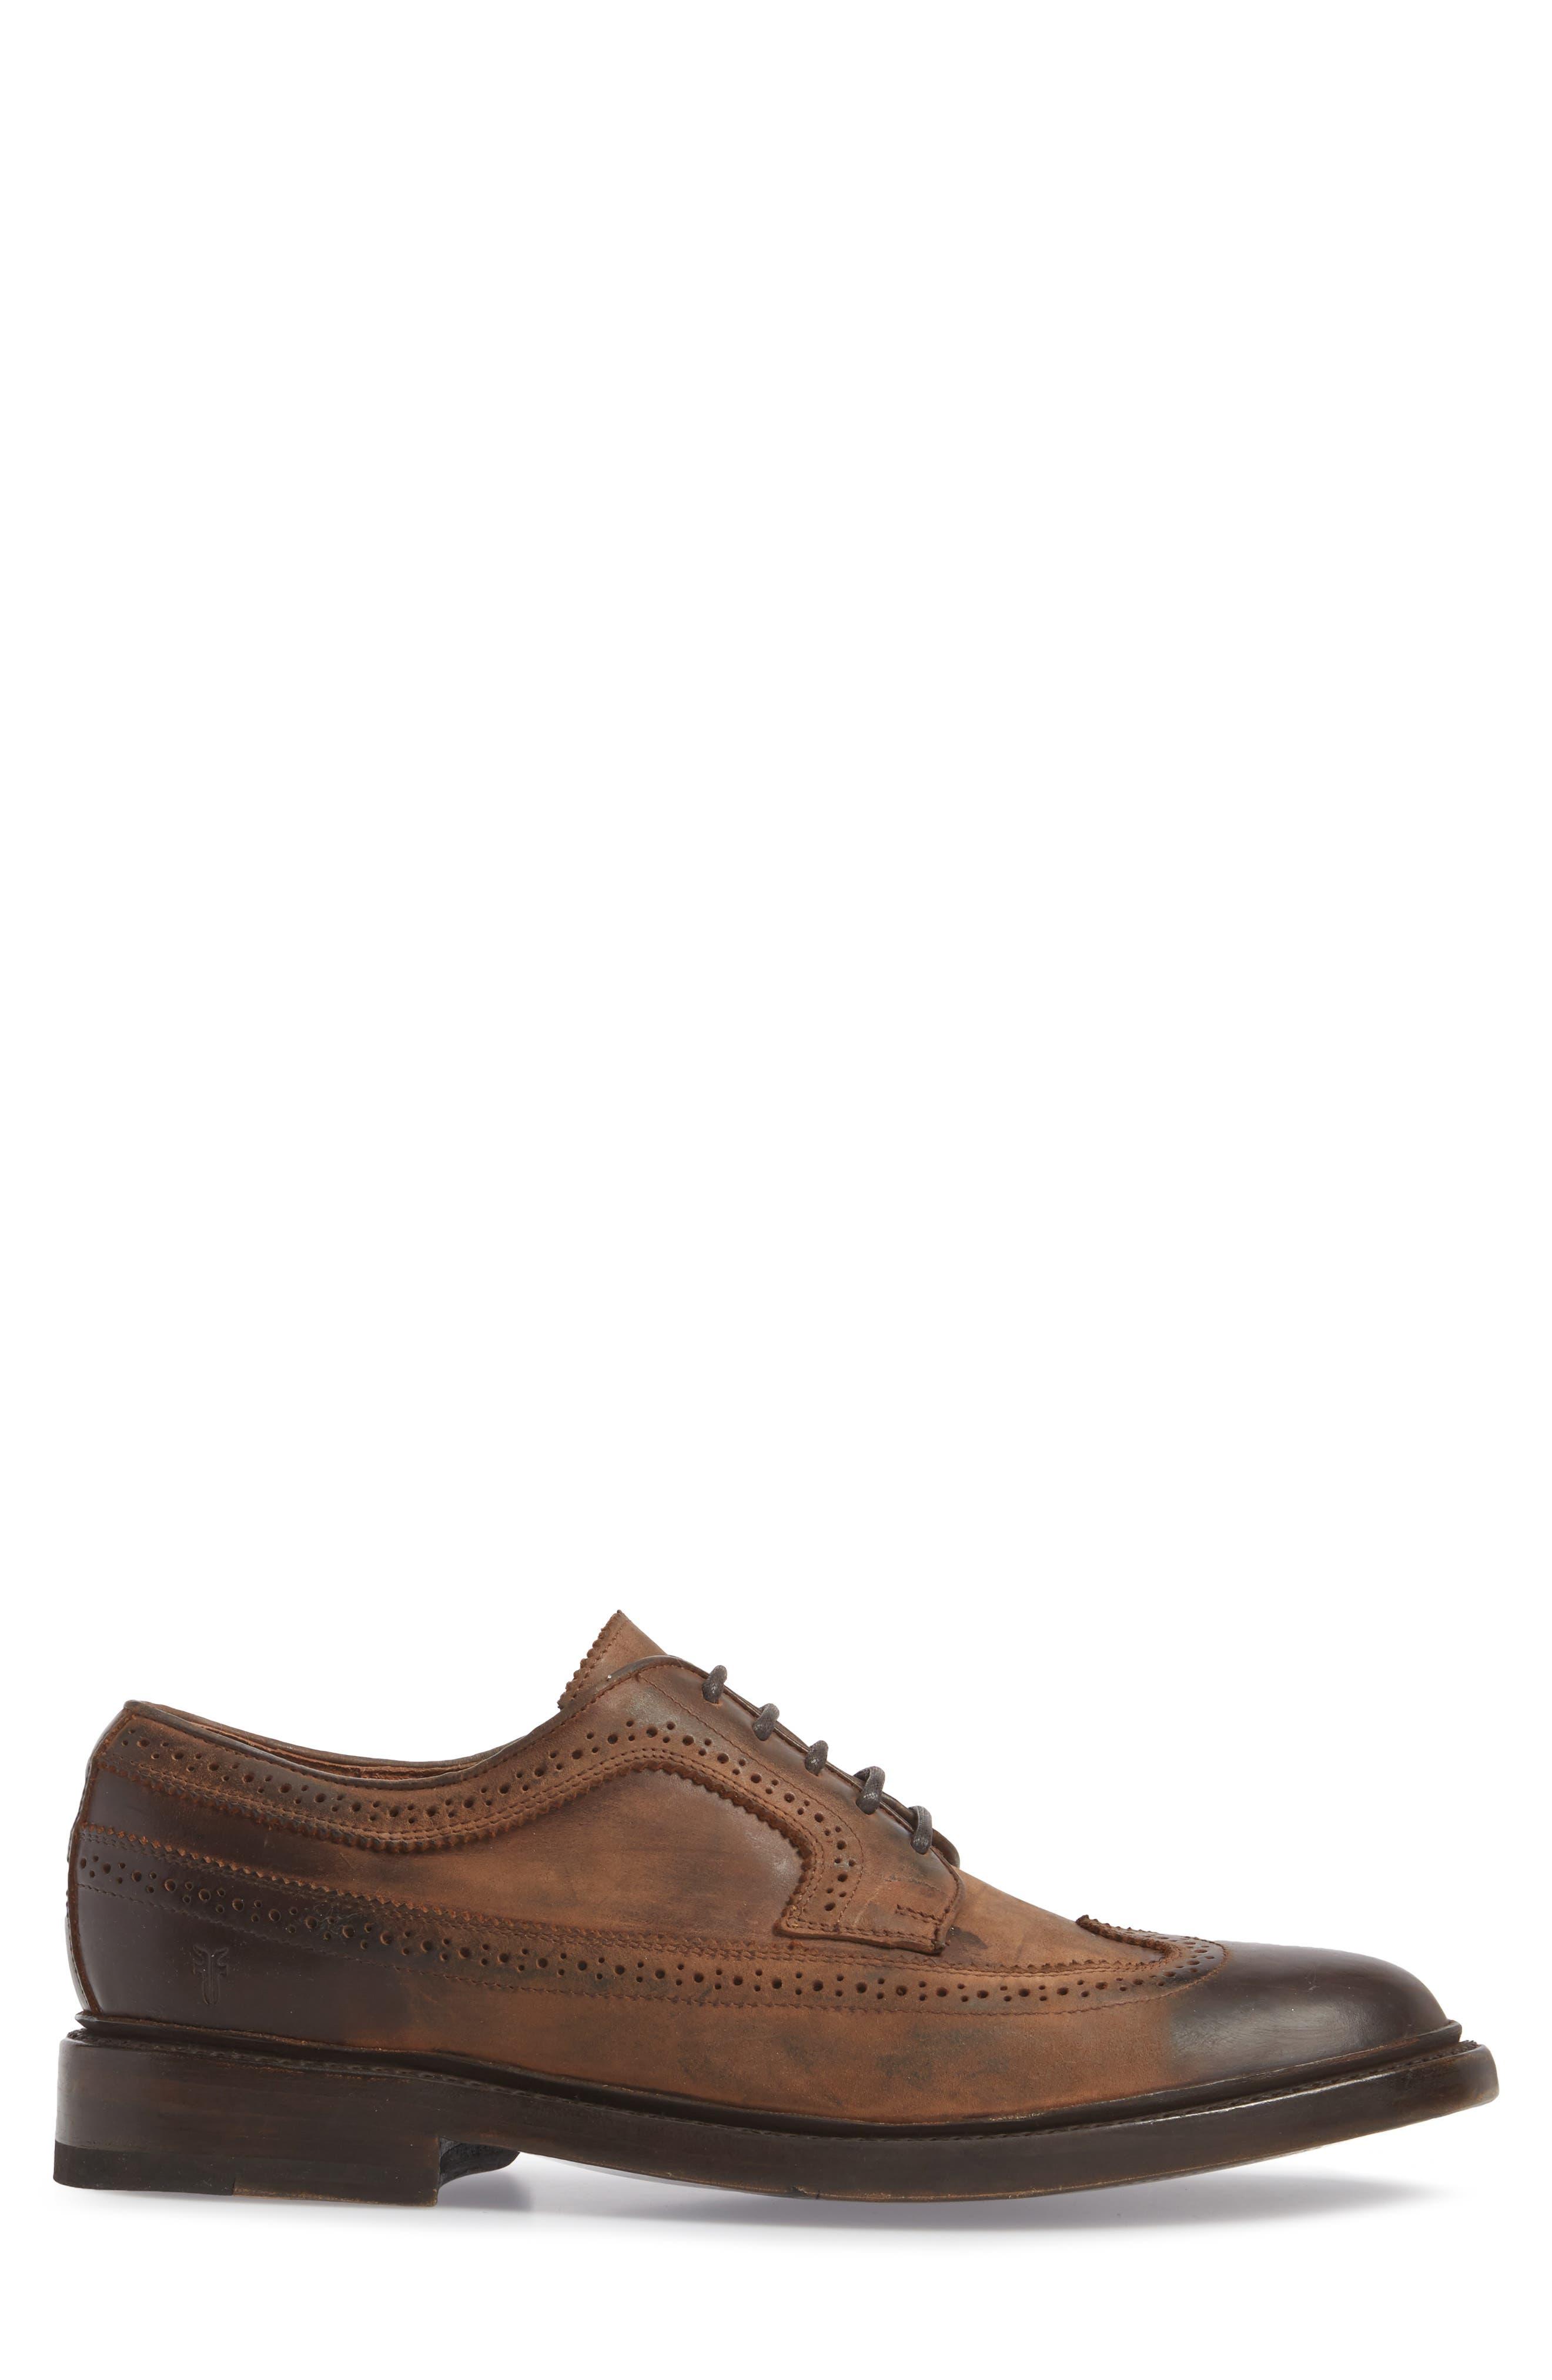 Jones Wingtip,                             Alternate thumbnail 3, color,                             Redwood Leather